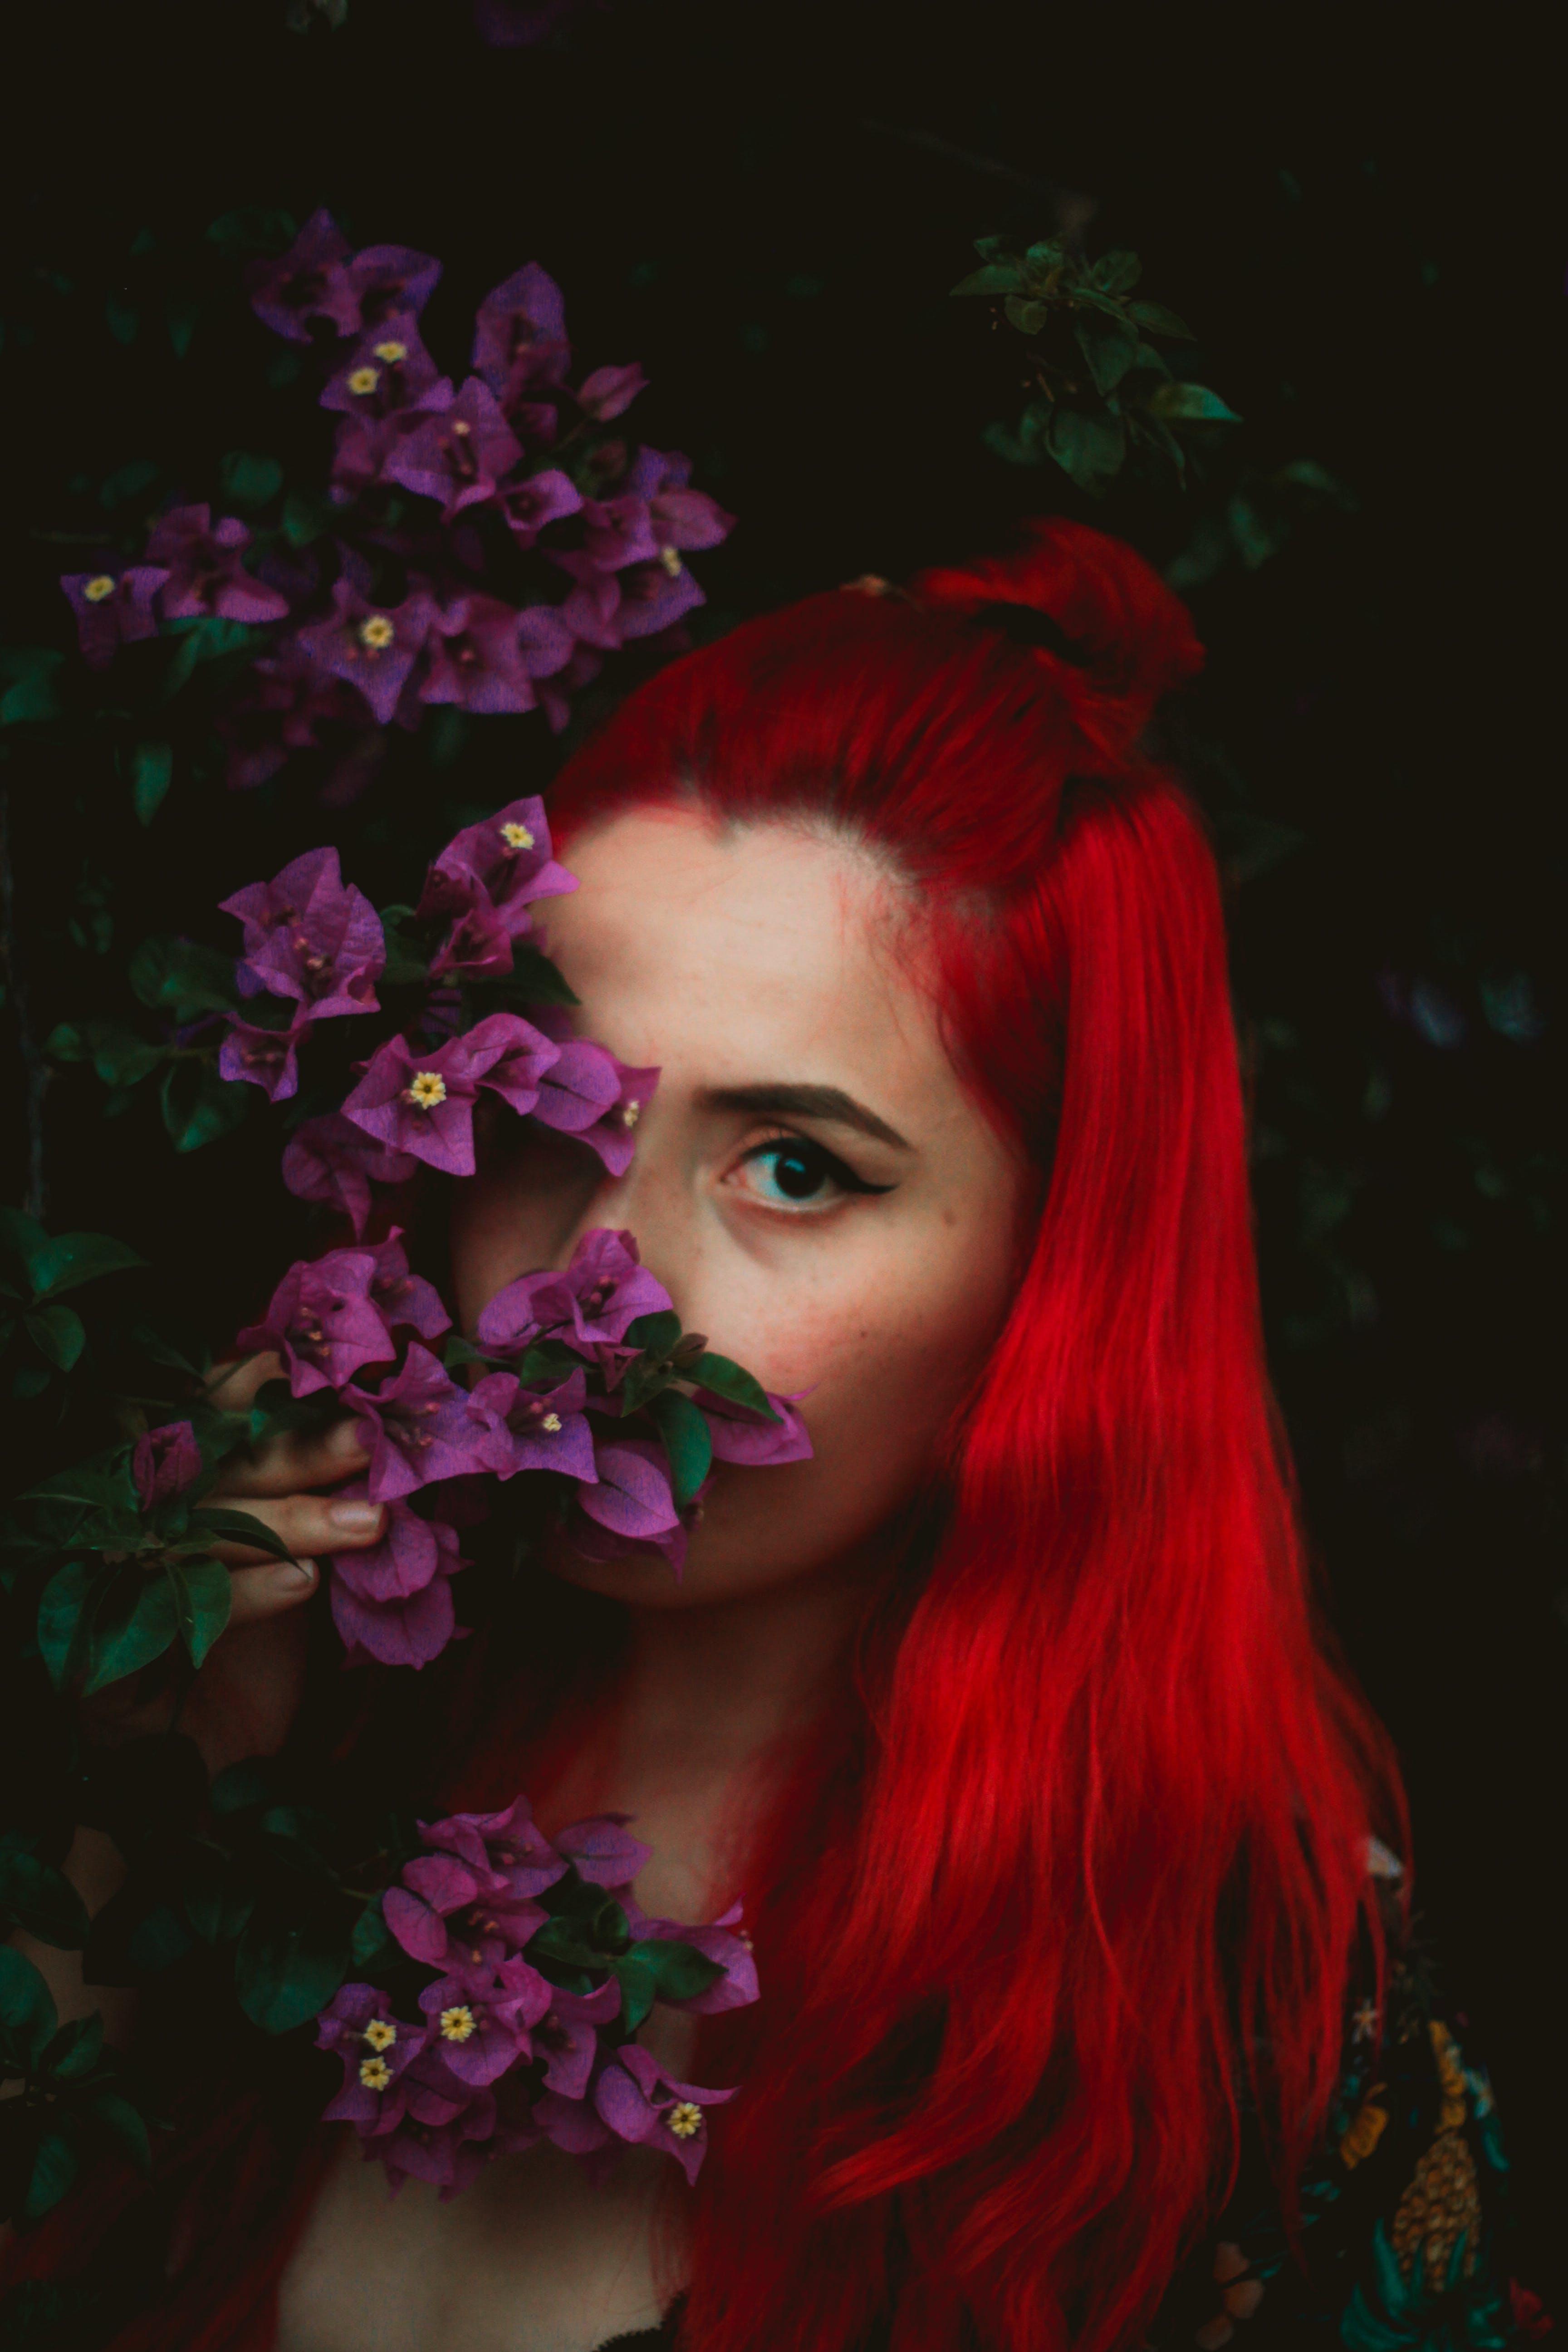 cabells pèl-roigs, cabells pèl-rojos, cabells vermells